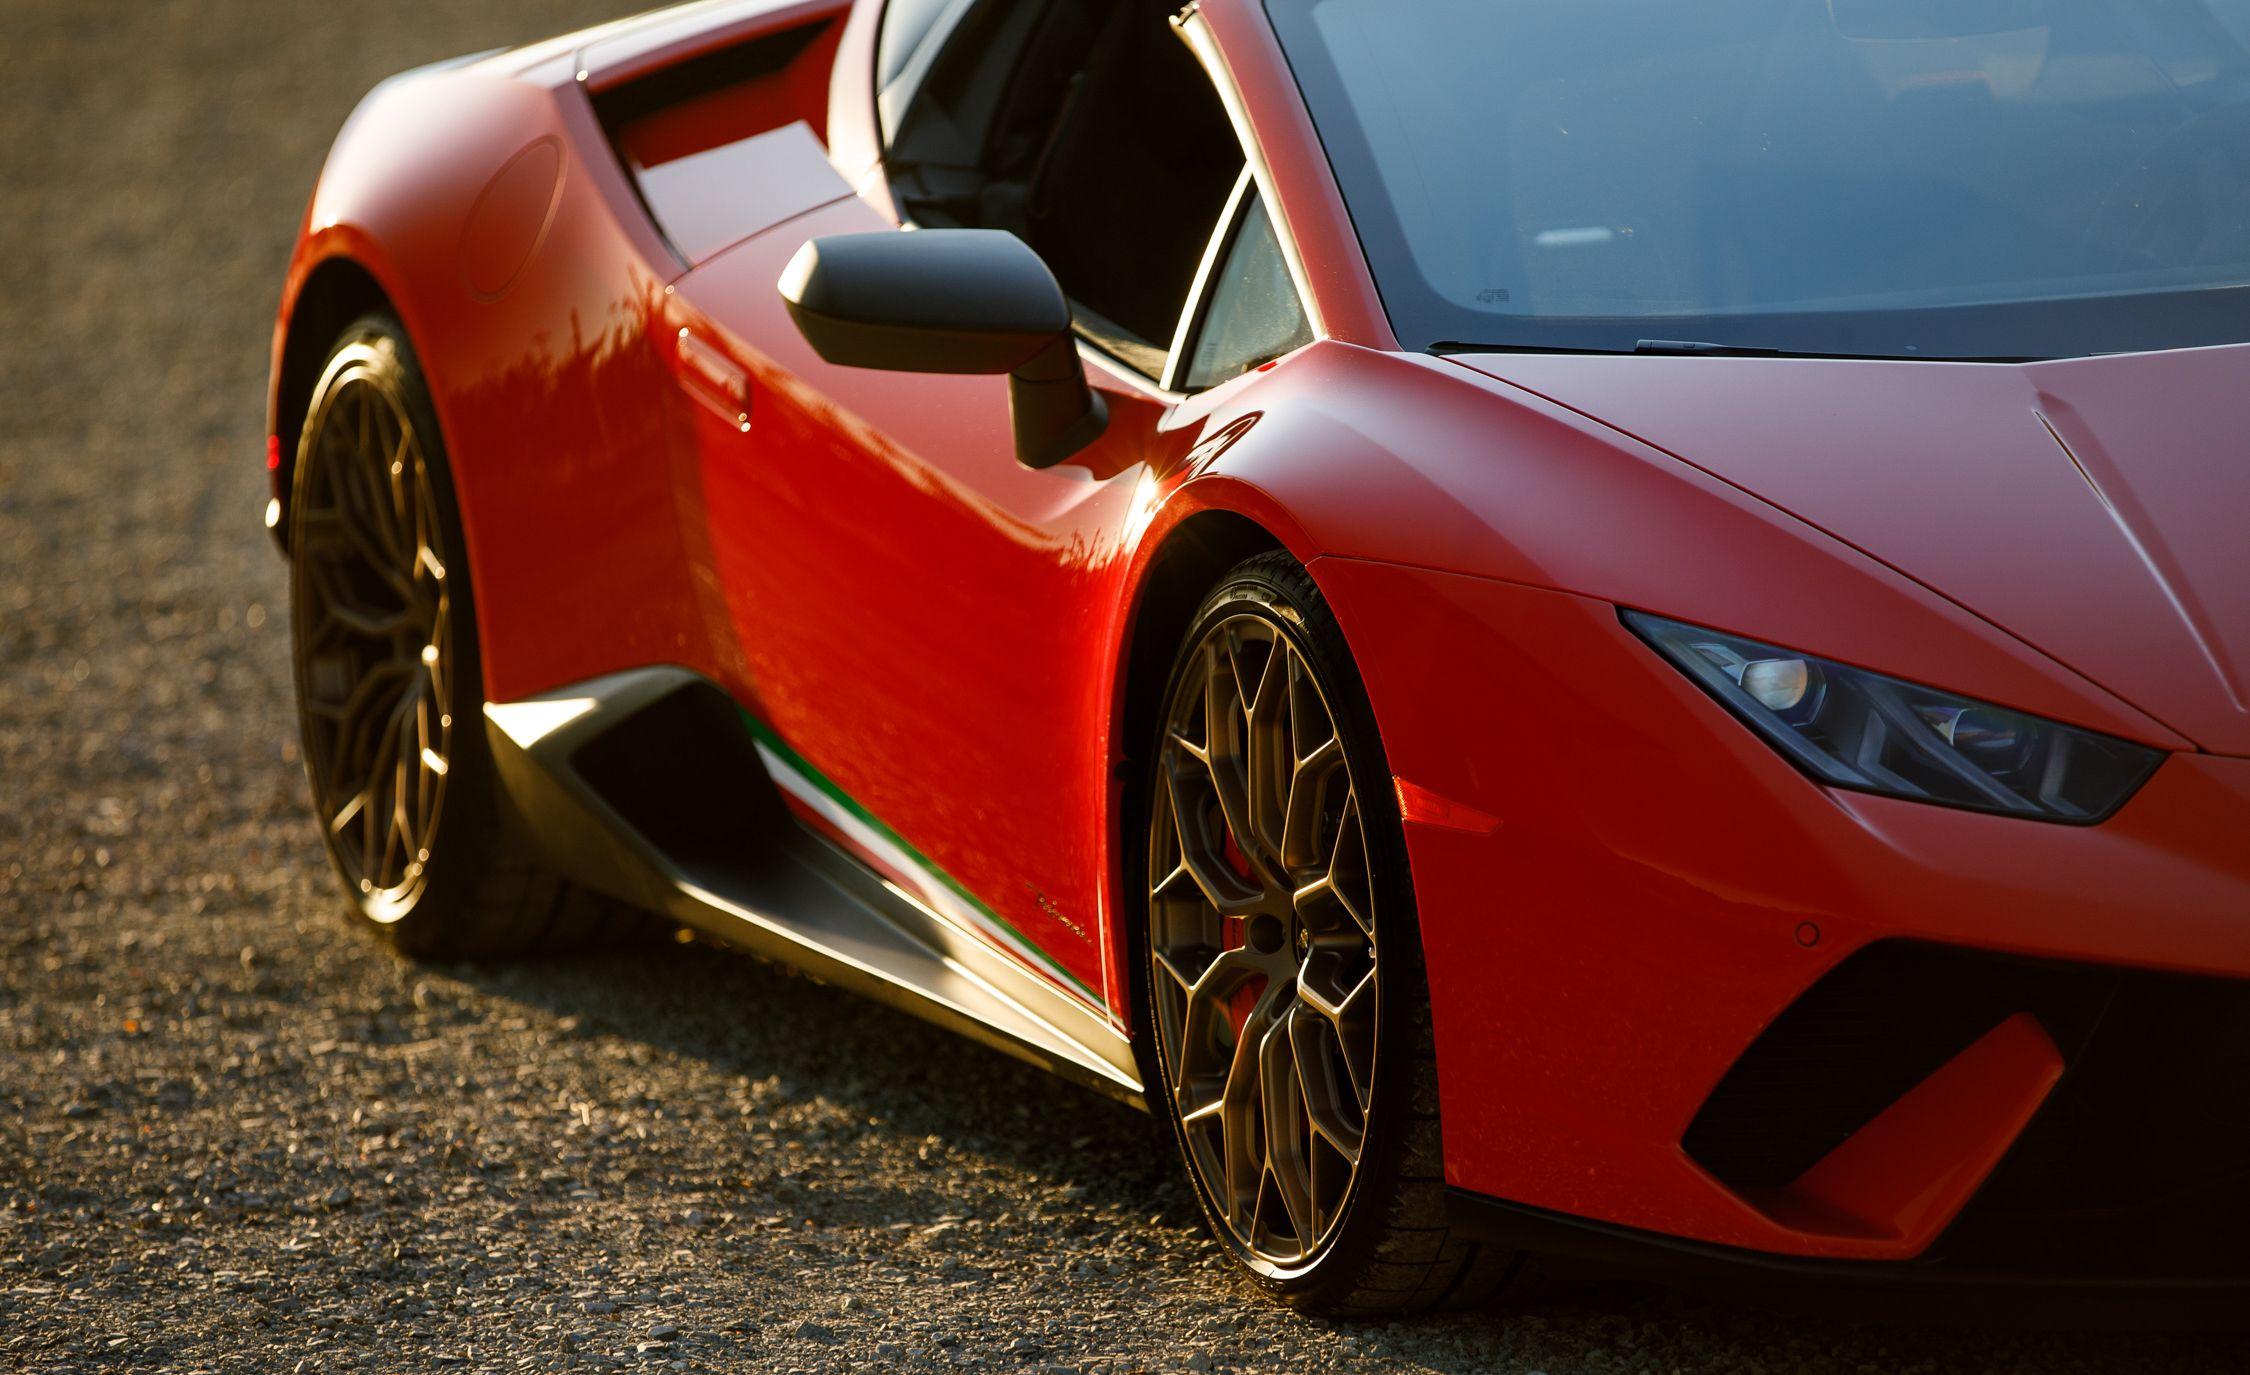 2018 Lamborghini Huracán Performante Spyder Photo Gallery